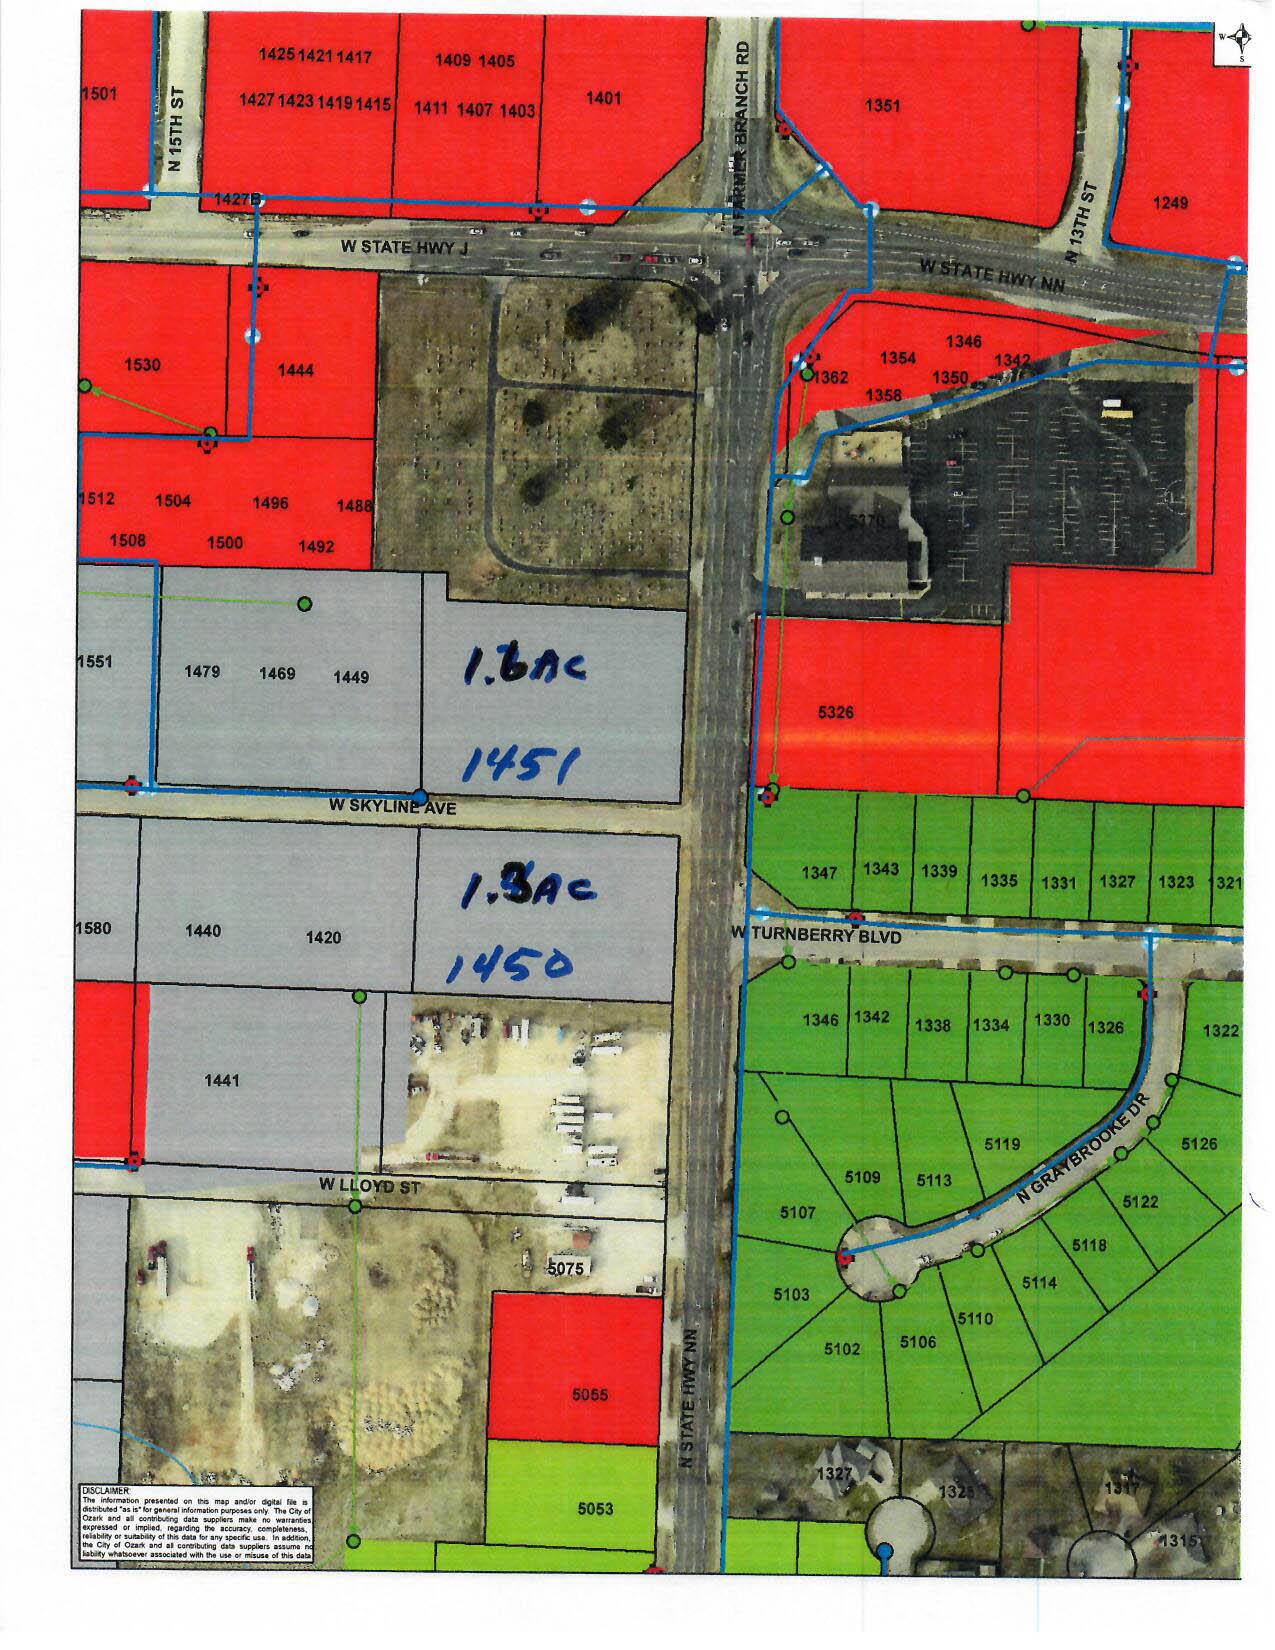 1450 West Skyline Avenue Ozark, MO 65721